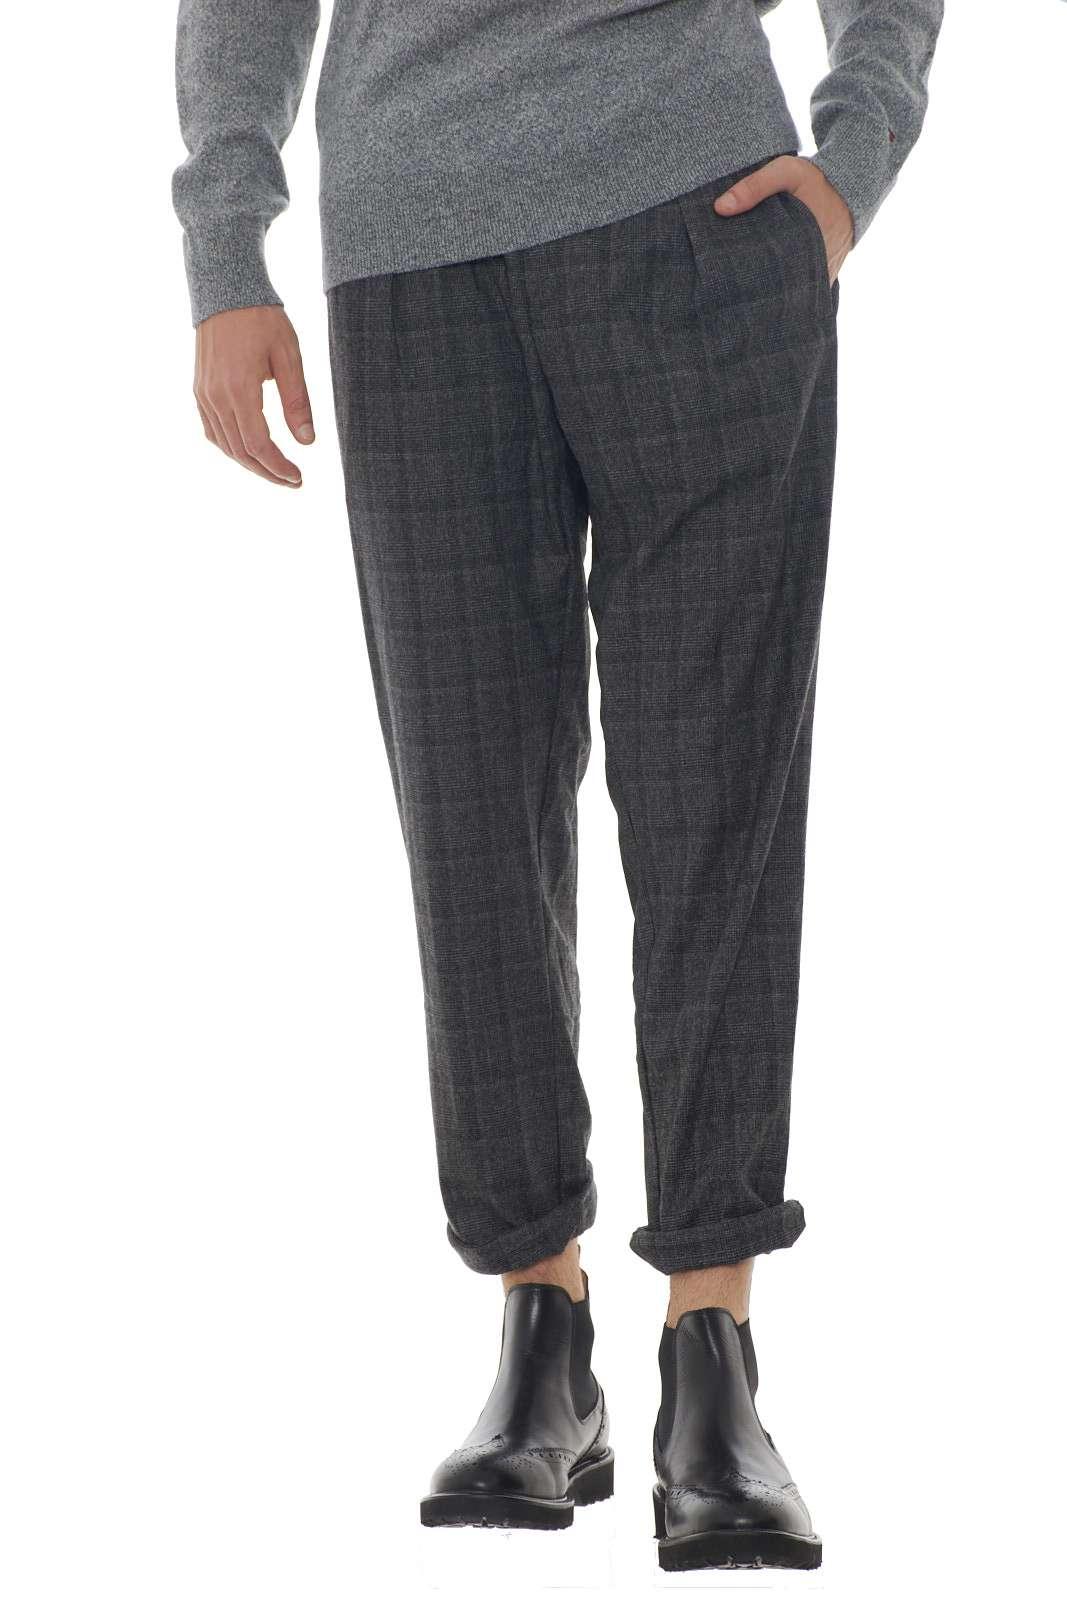 https://www.parmax.com/media/catalog/product/a/i/AI-outlet_parmax-pantaloni-uomo-Micheal%20Coal-carl3305-B_1.jpg